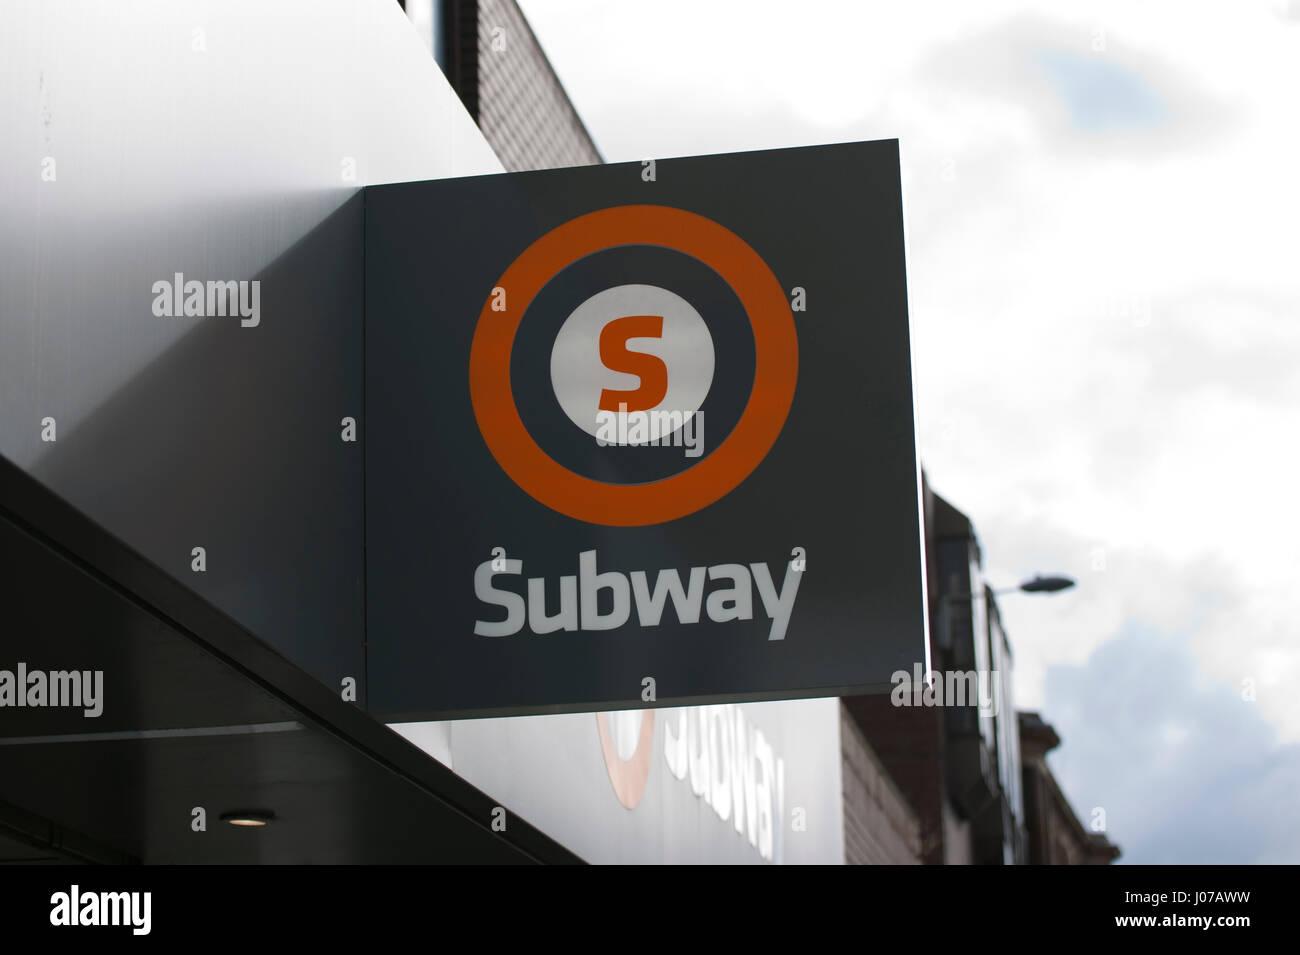 Glasgow Subway and Underground Sign and Branding - Stock Image